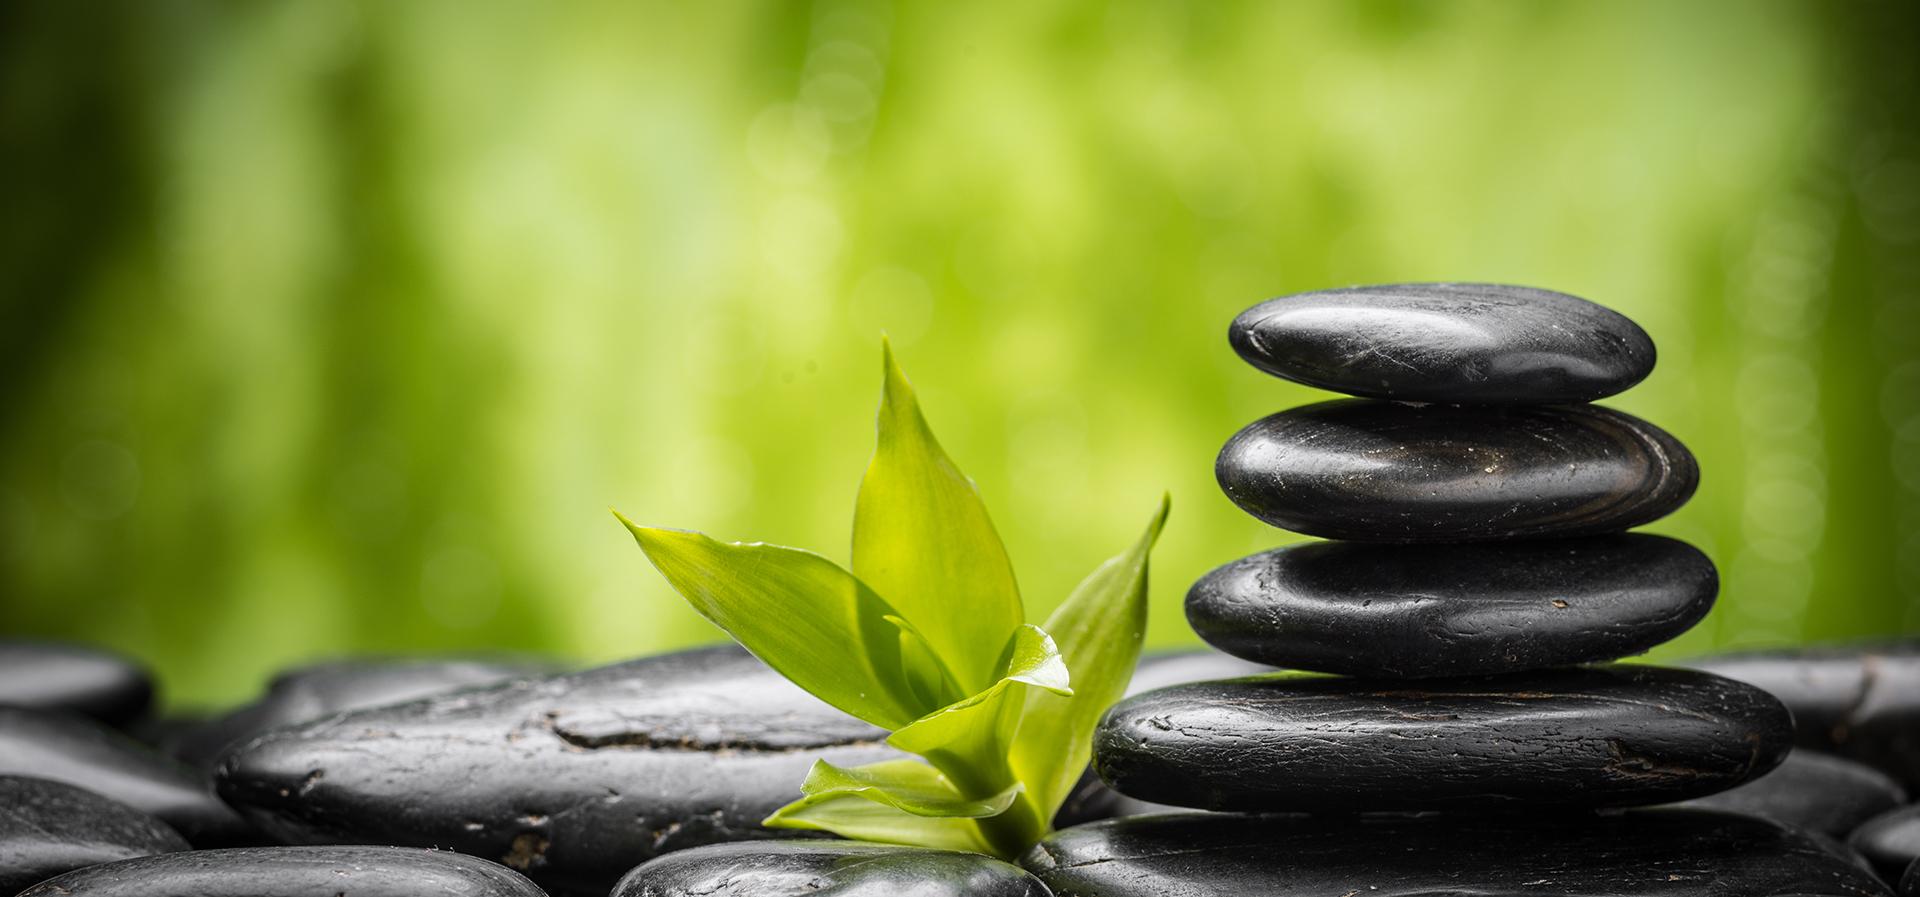 le bambou spa pierre caillou contexte balance la th u00e9rapie